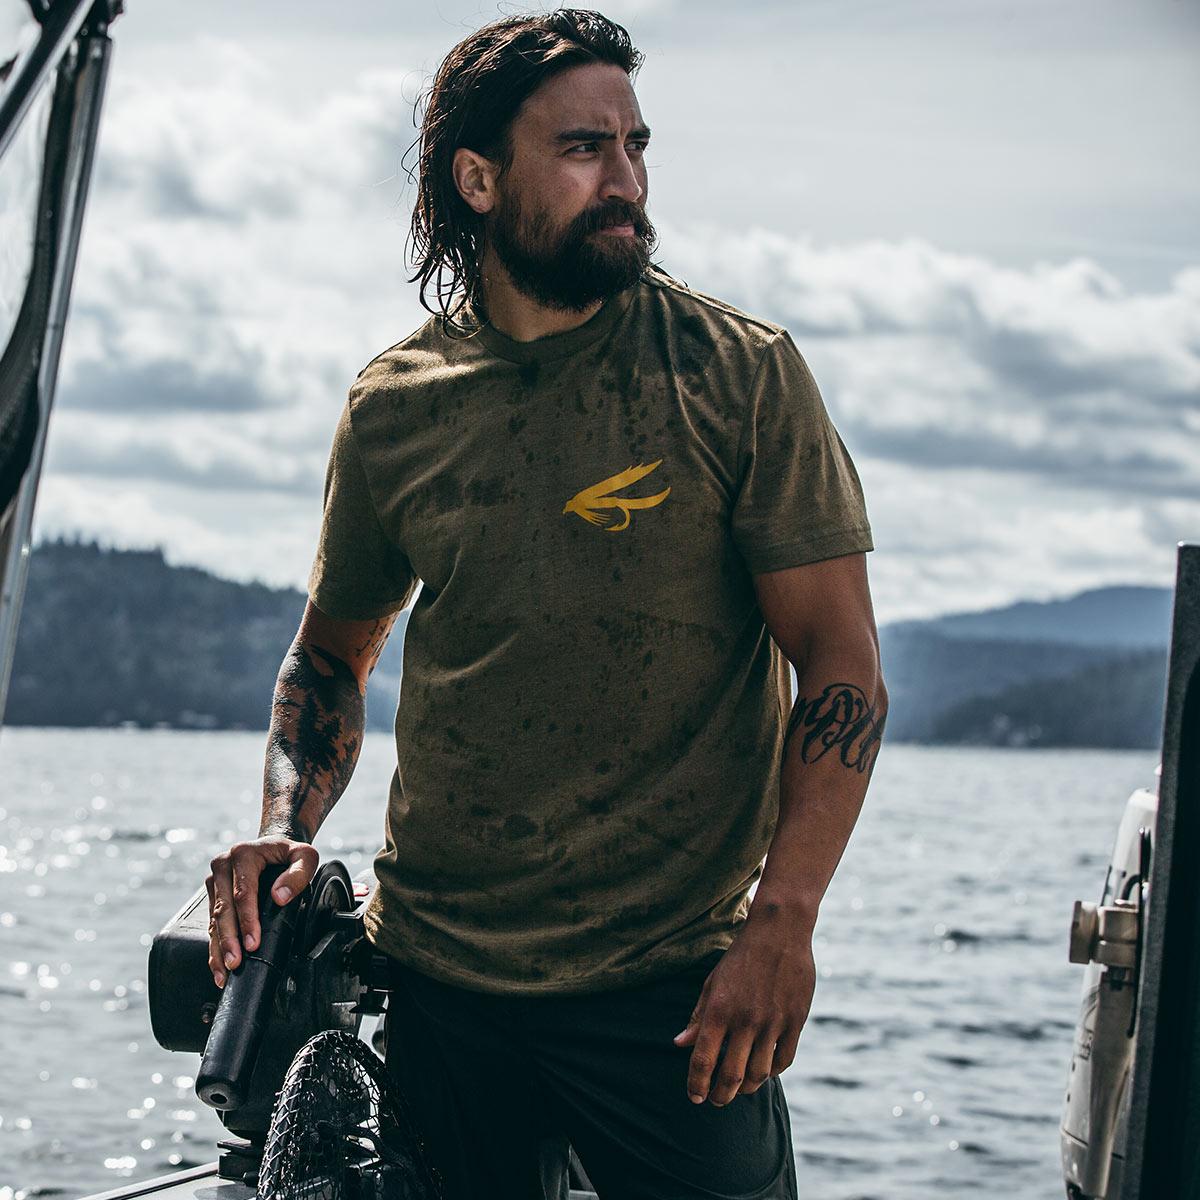 Filson Buckshot T-Shirt Olive Drab Heather, hoogwaardig T-shirt met UPF 50+ zonwering